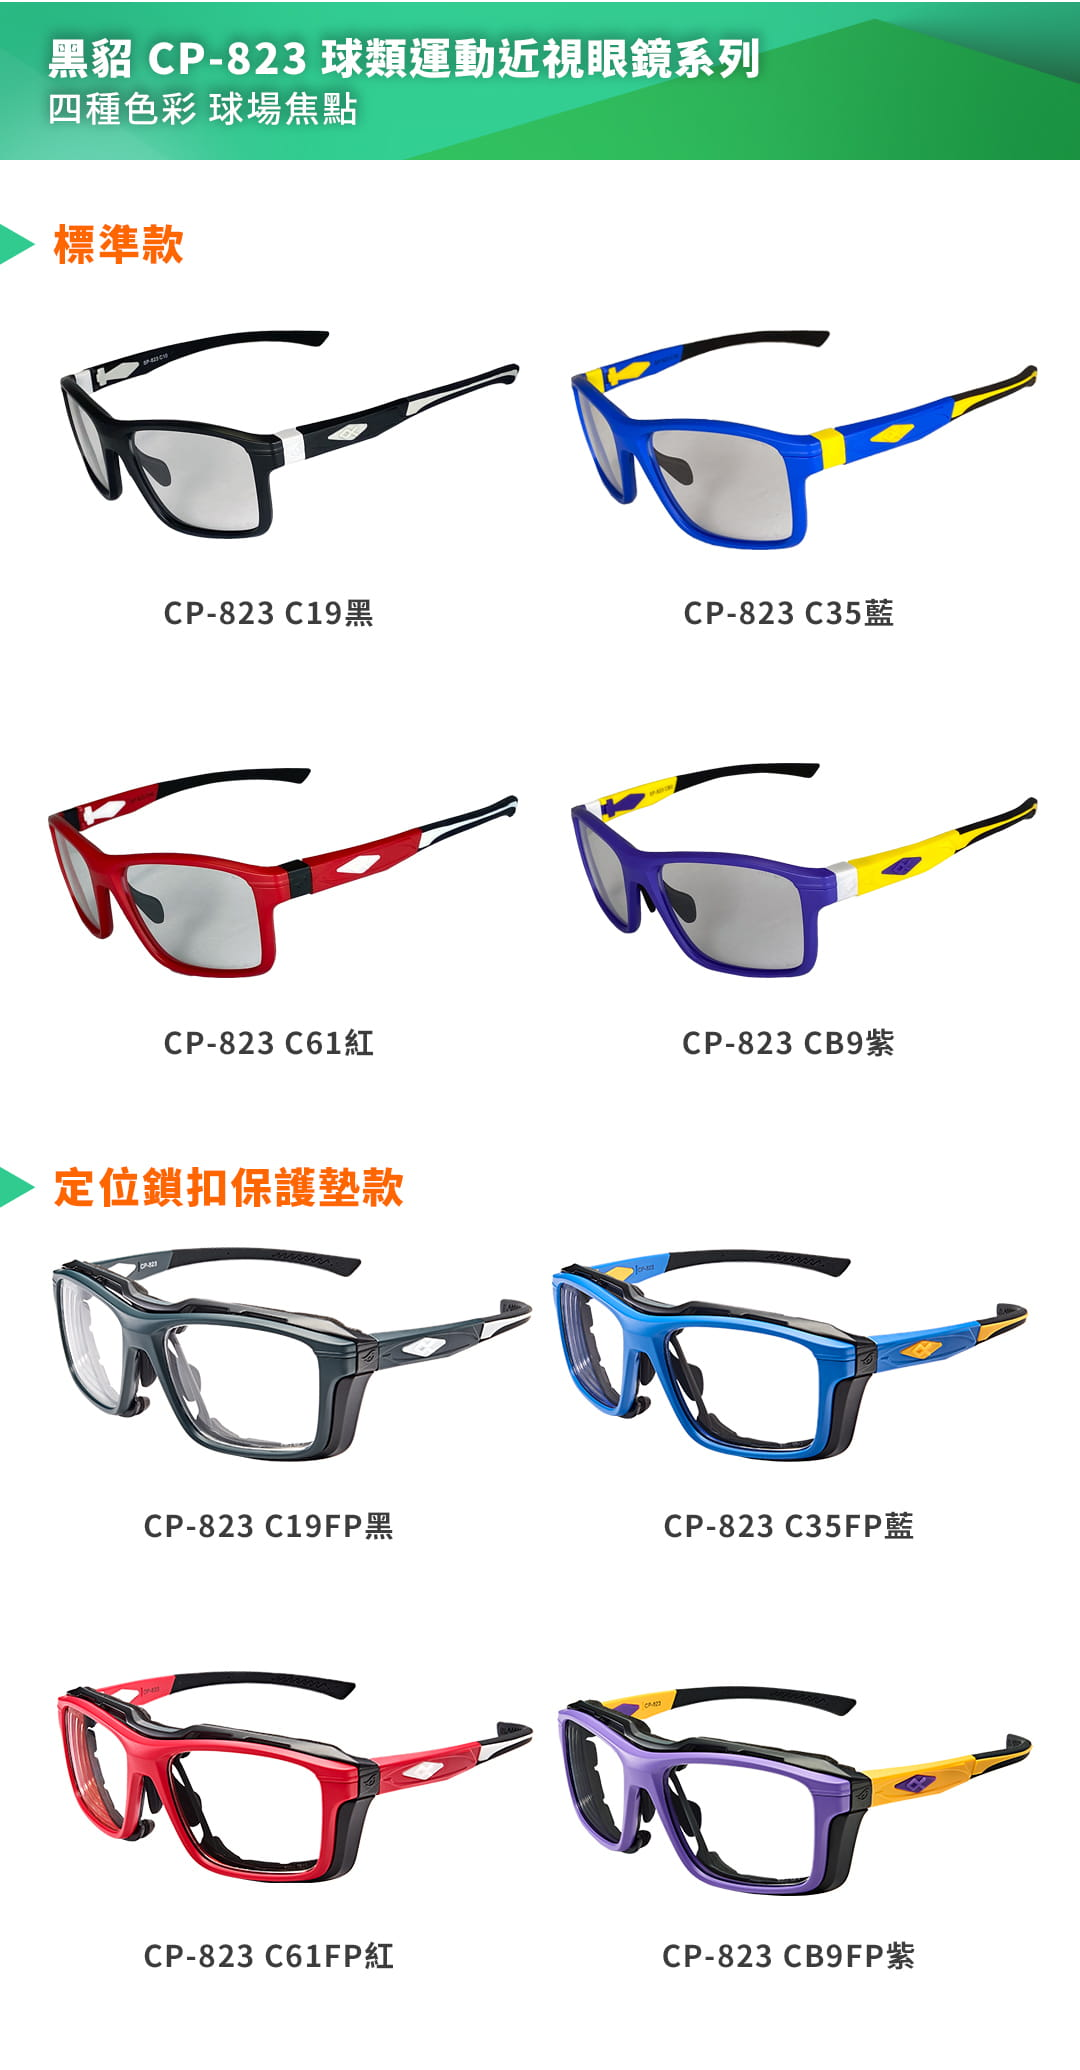 SABLE黑貂光學-專屬球類運動眼鏡CP-823(標準款-無保護墊)+SP-03(平光精緻鍍膜鏡片) 3